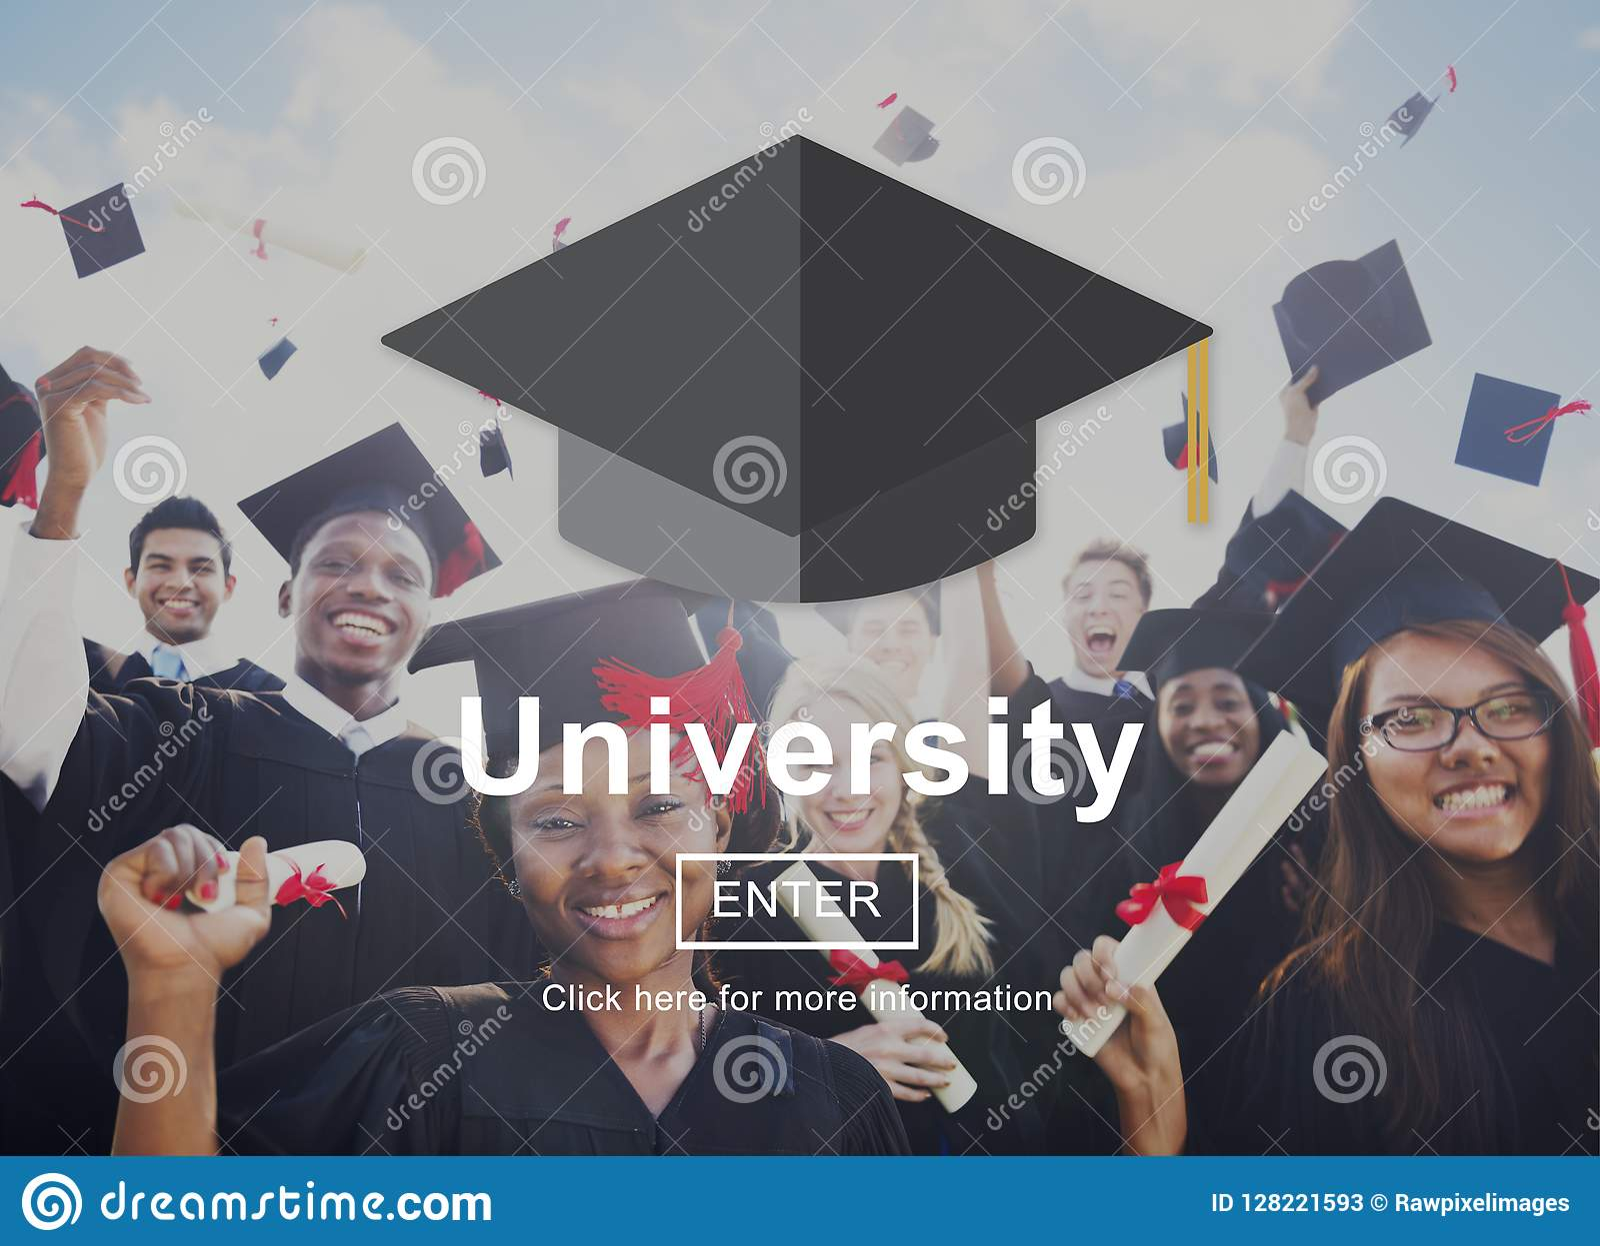 Conceito do ensino universitário do terreno da academia da universidade